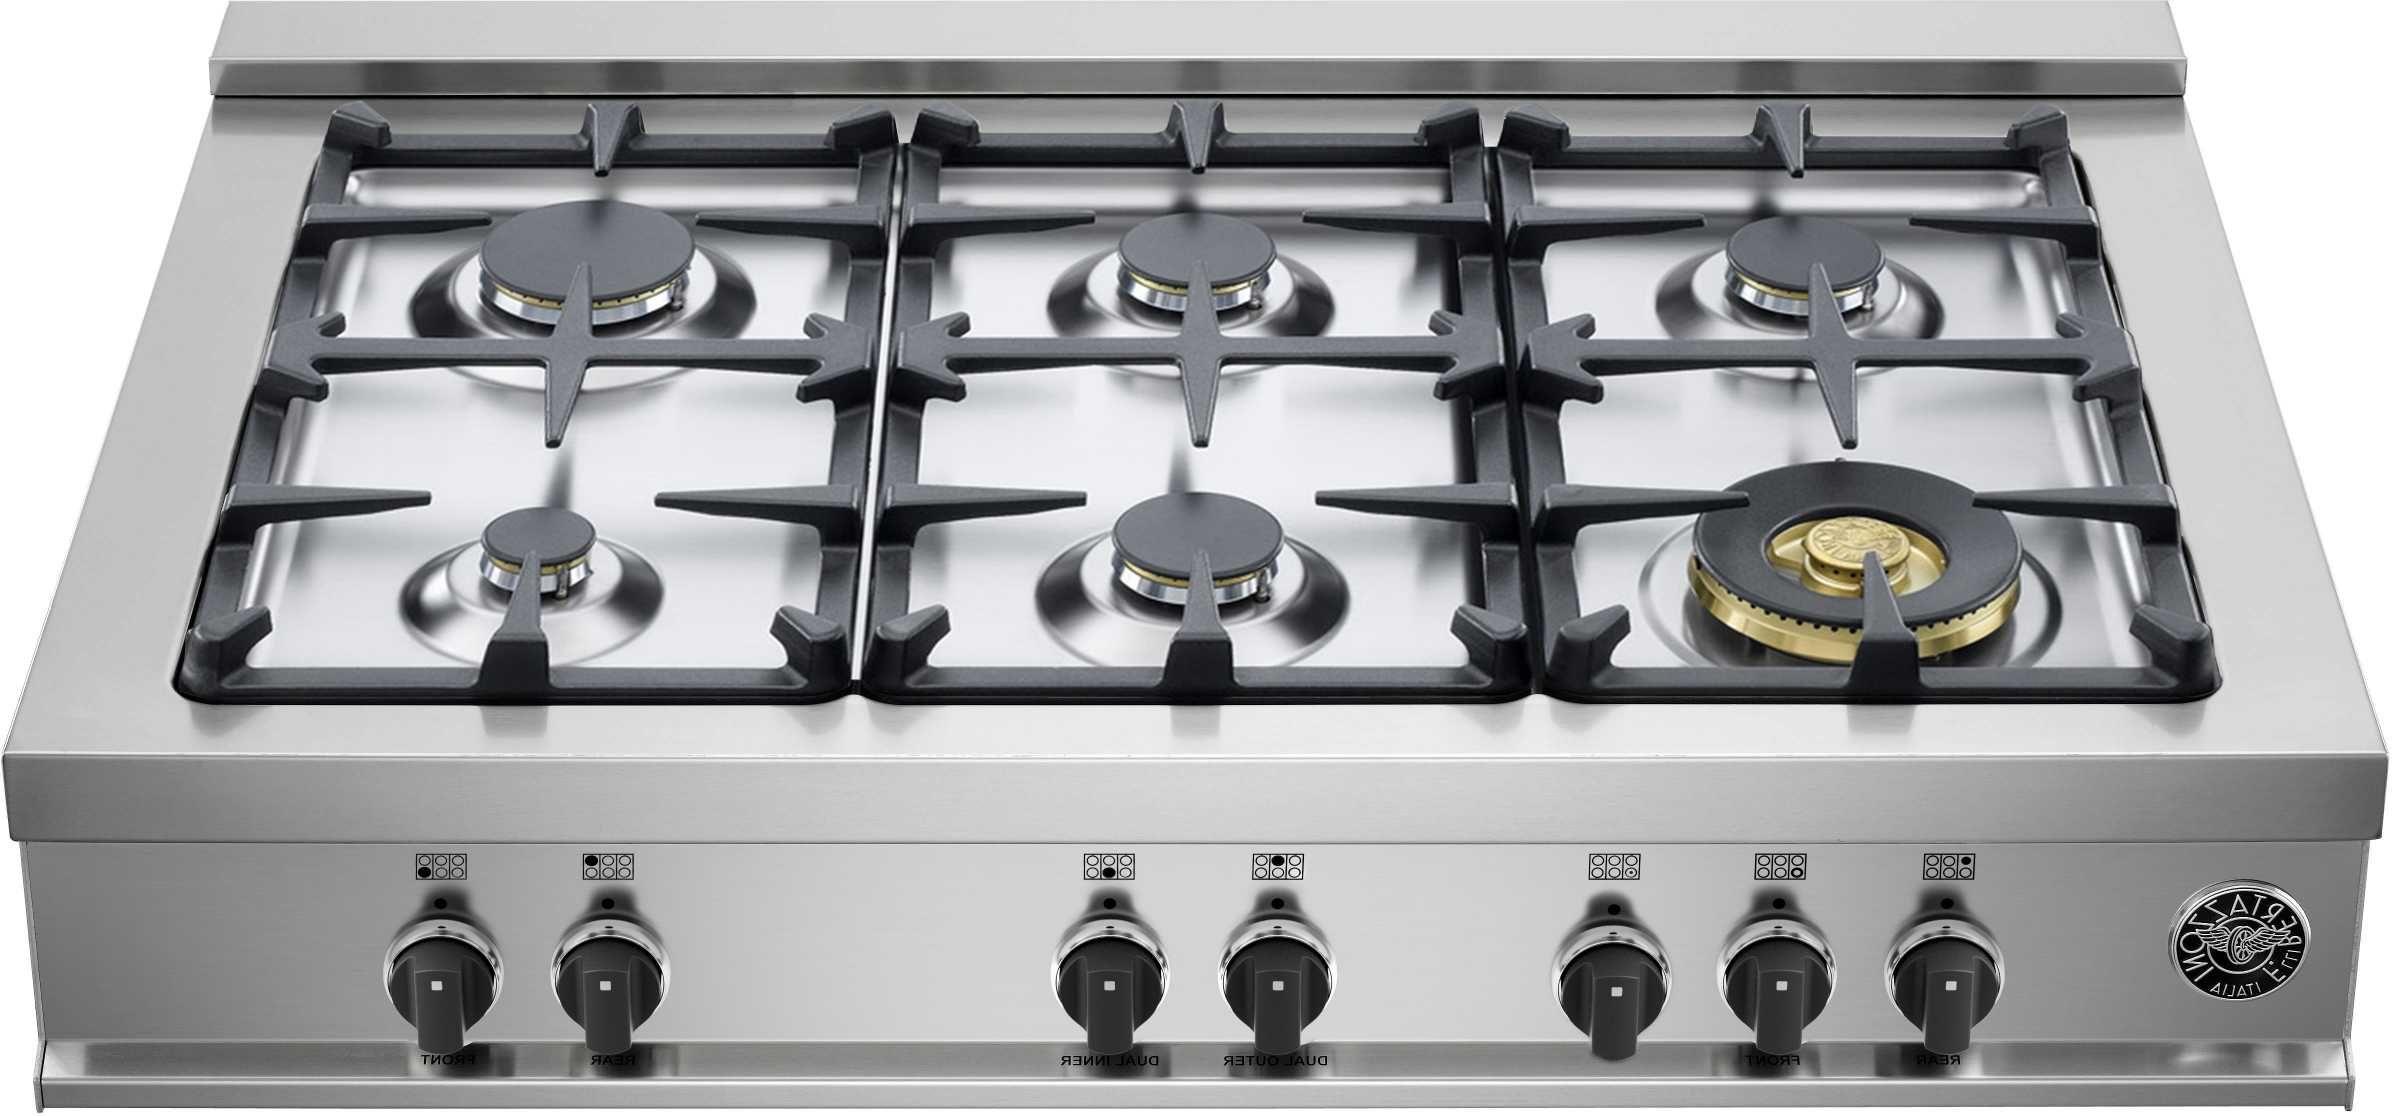 Bertazzoni gas cooktops kitchen stove info in pinterest